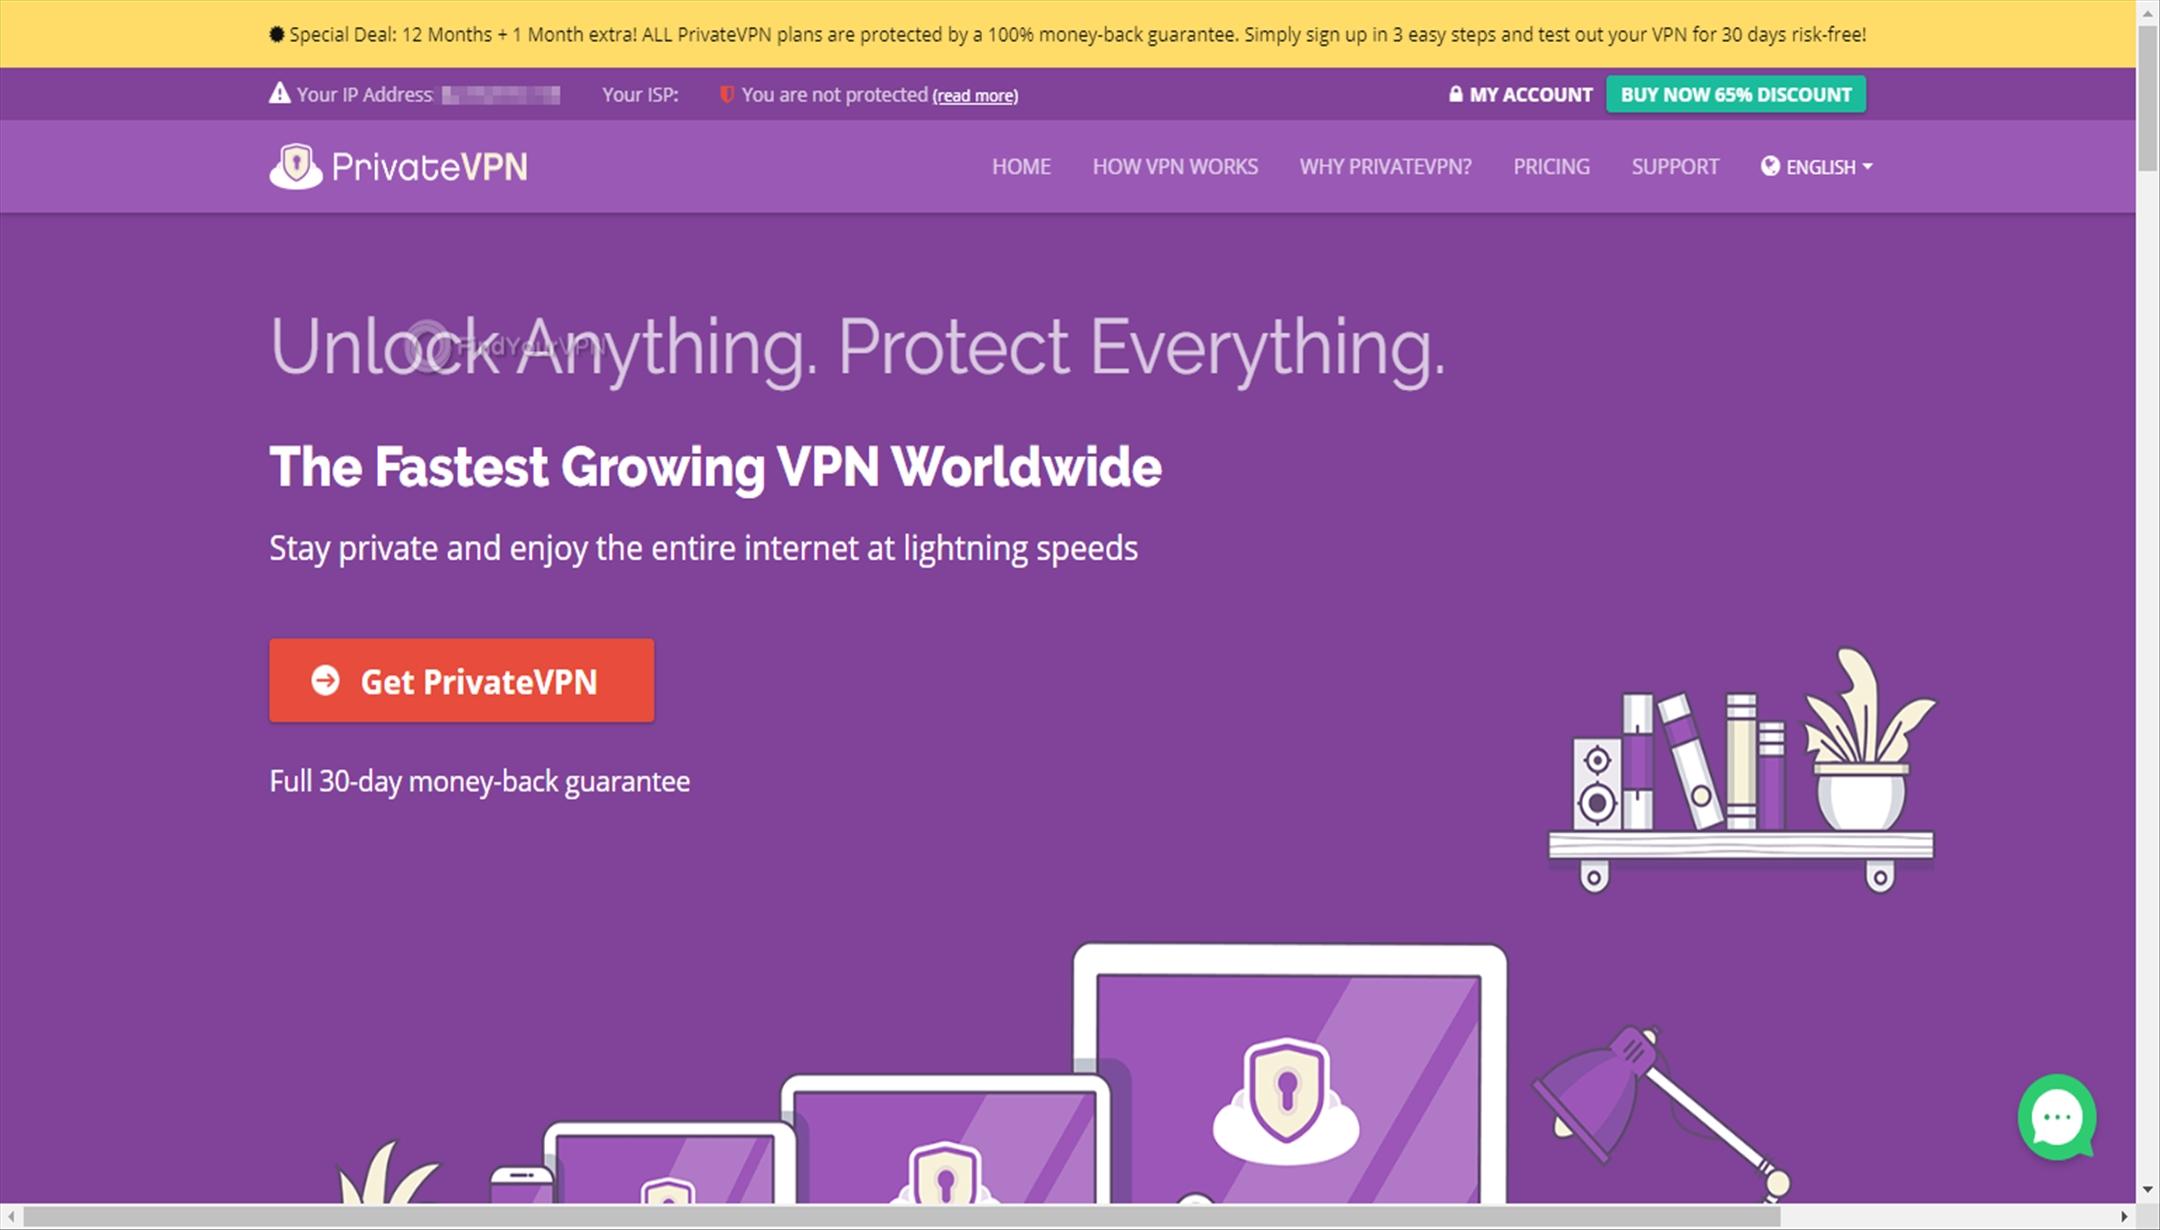 PrivateVPN landing page